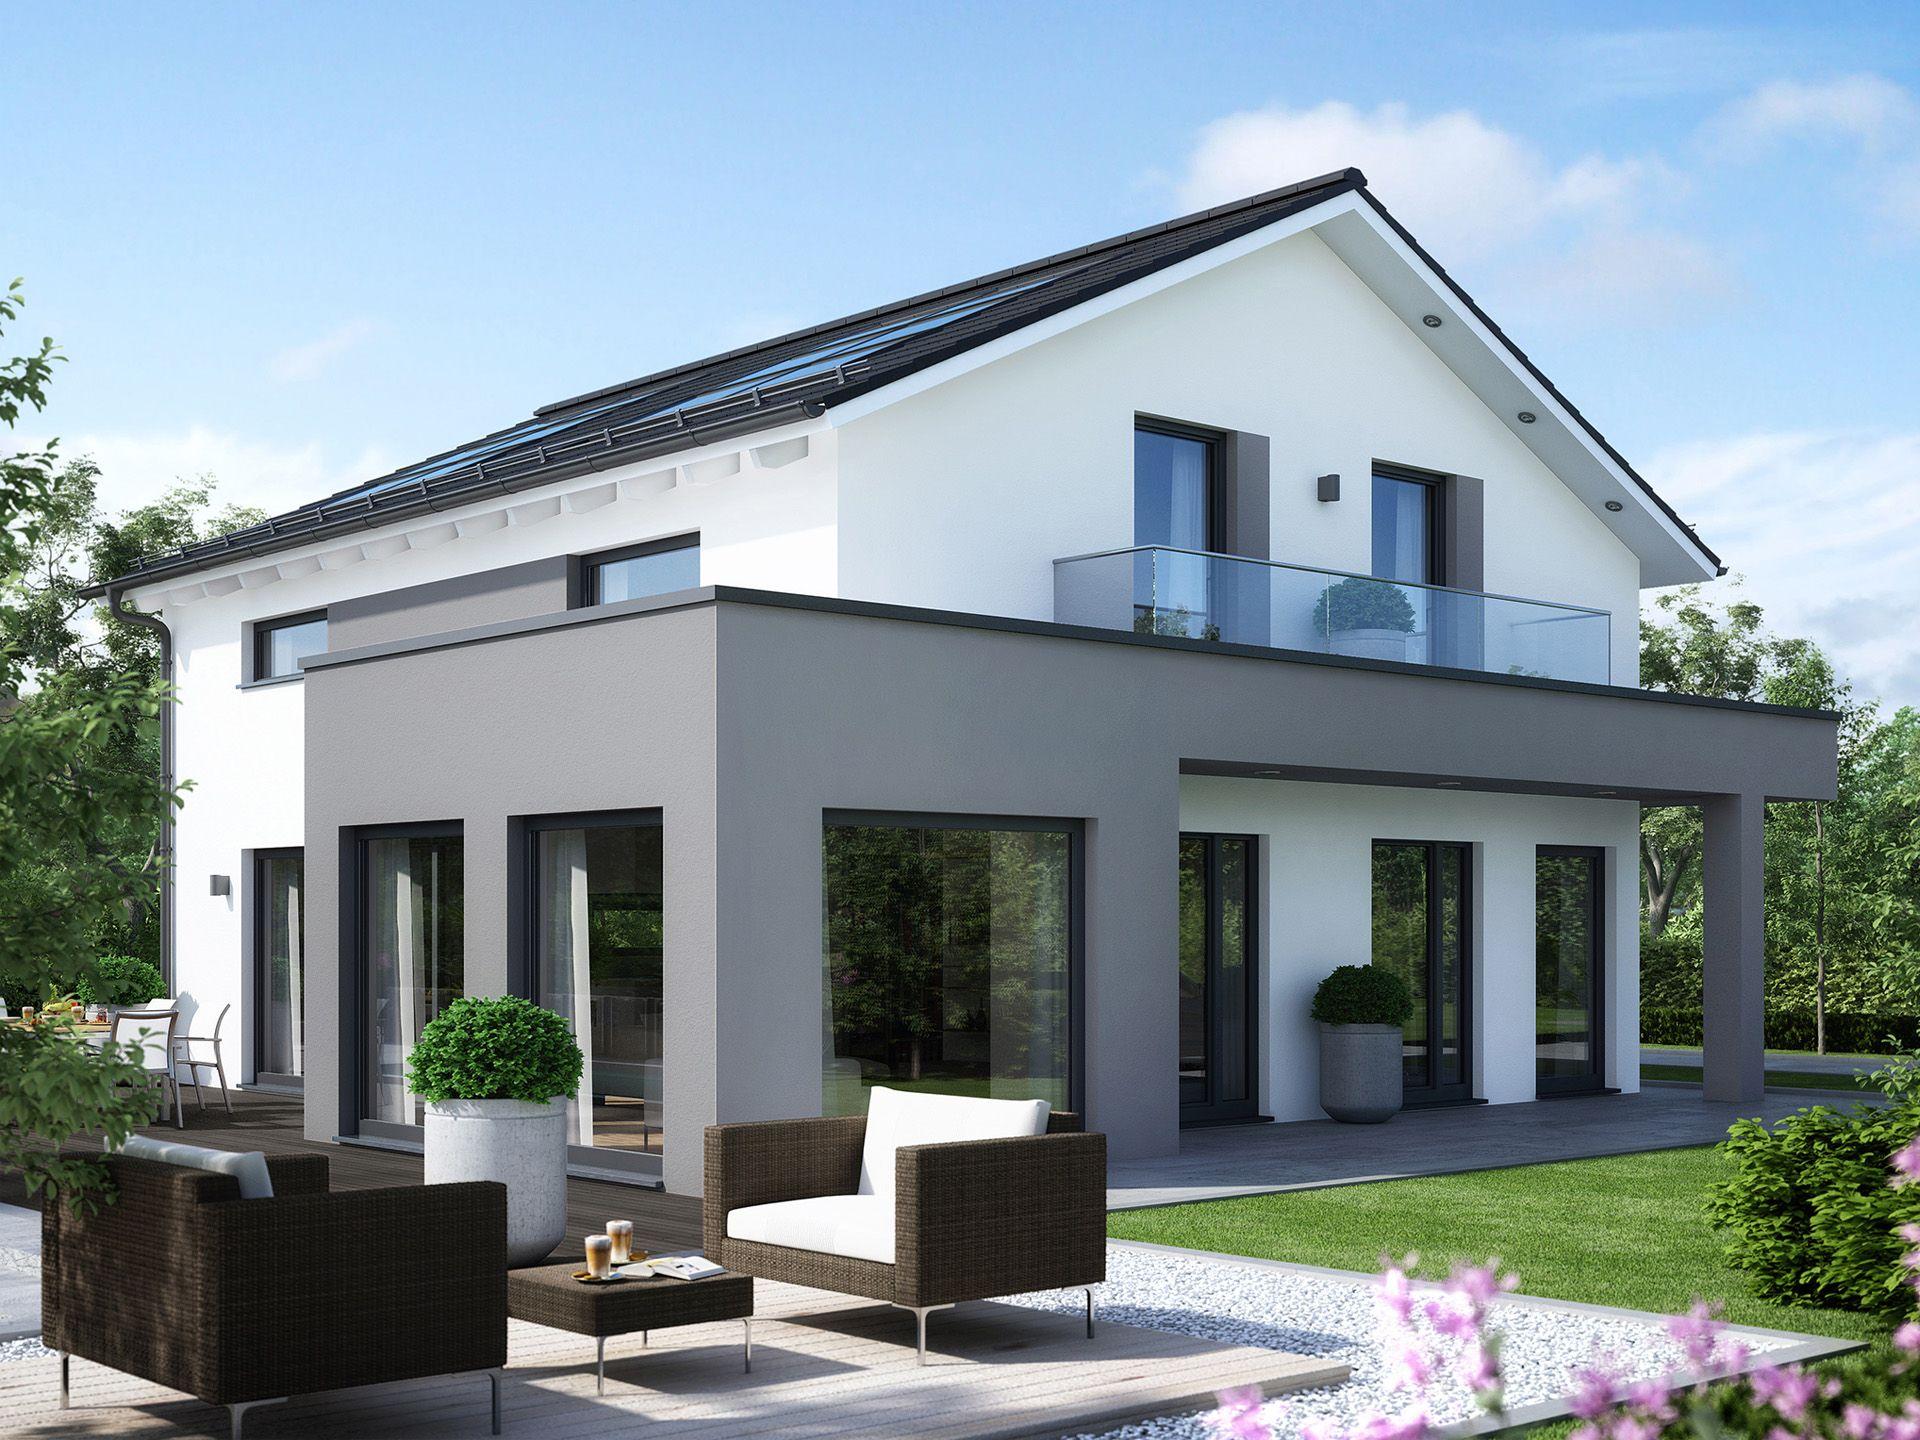 Aktionshaus sunshine 165 effizienzhaus von living haus for Musterhaus flachdach